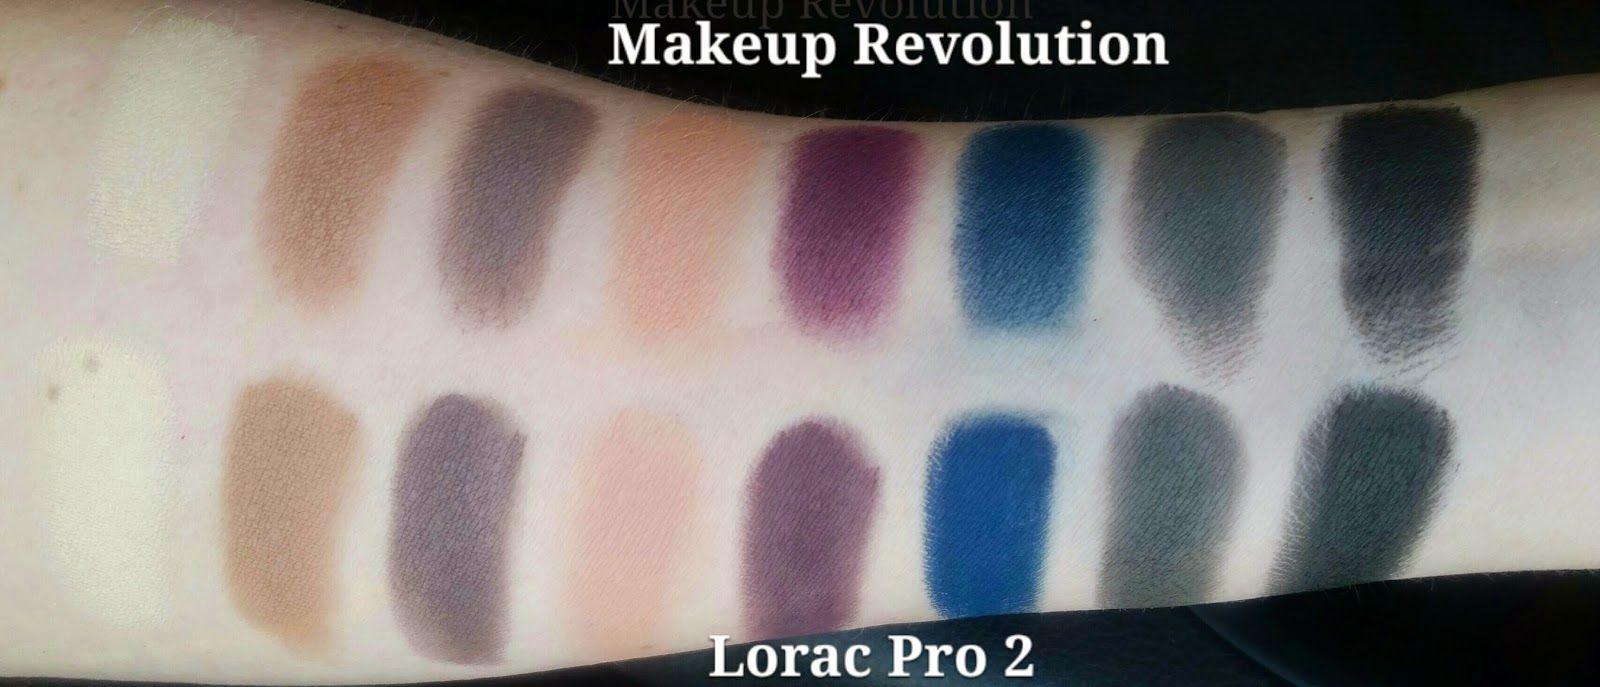 Makeup Revolution Iconic Pro 2 Swatches